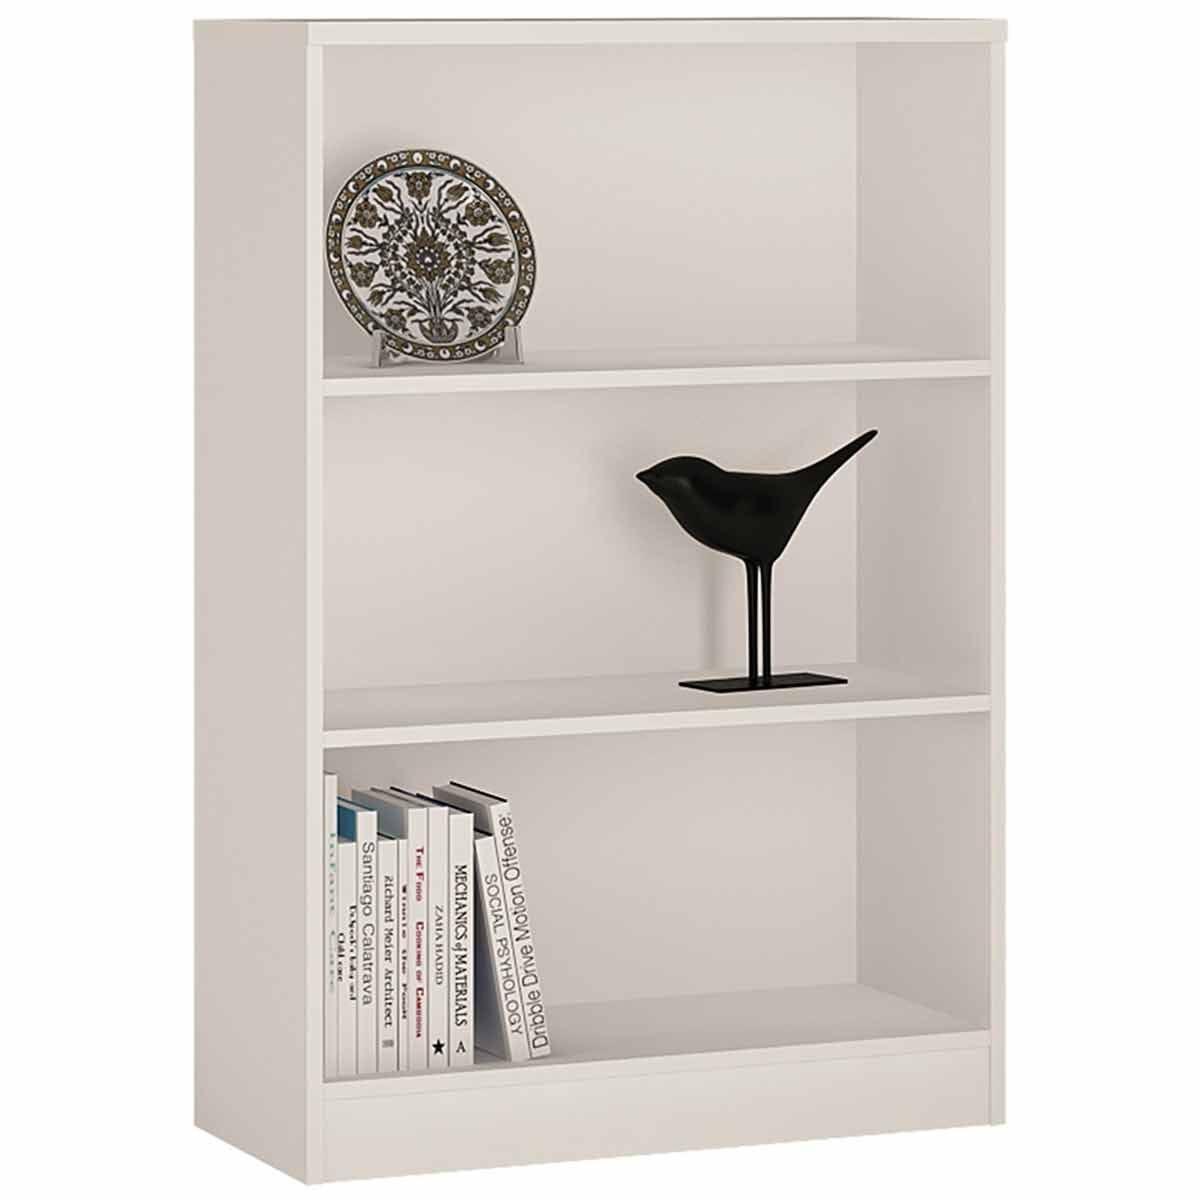 4 You Medium Wide Bookcase White